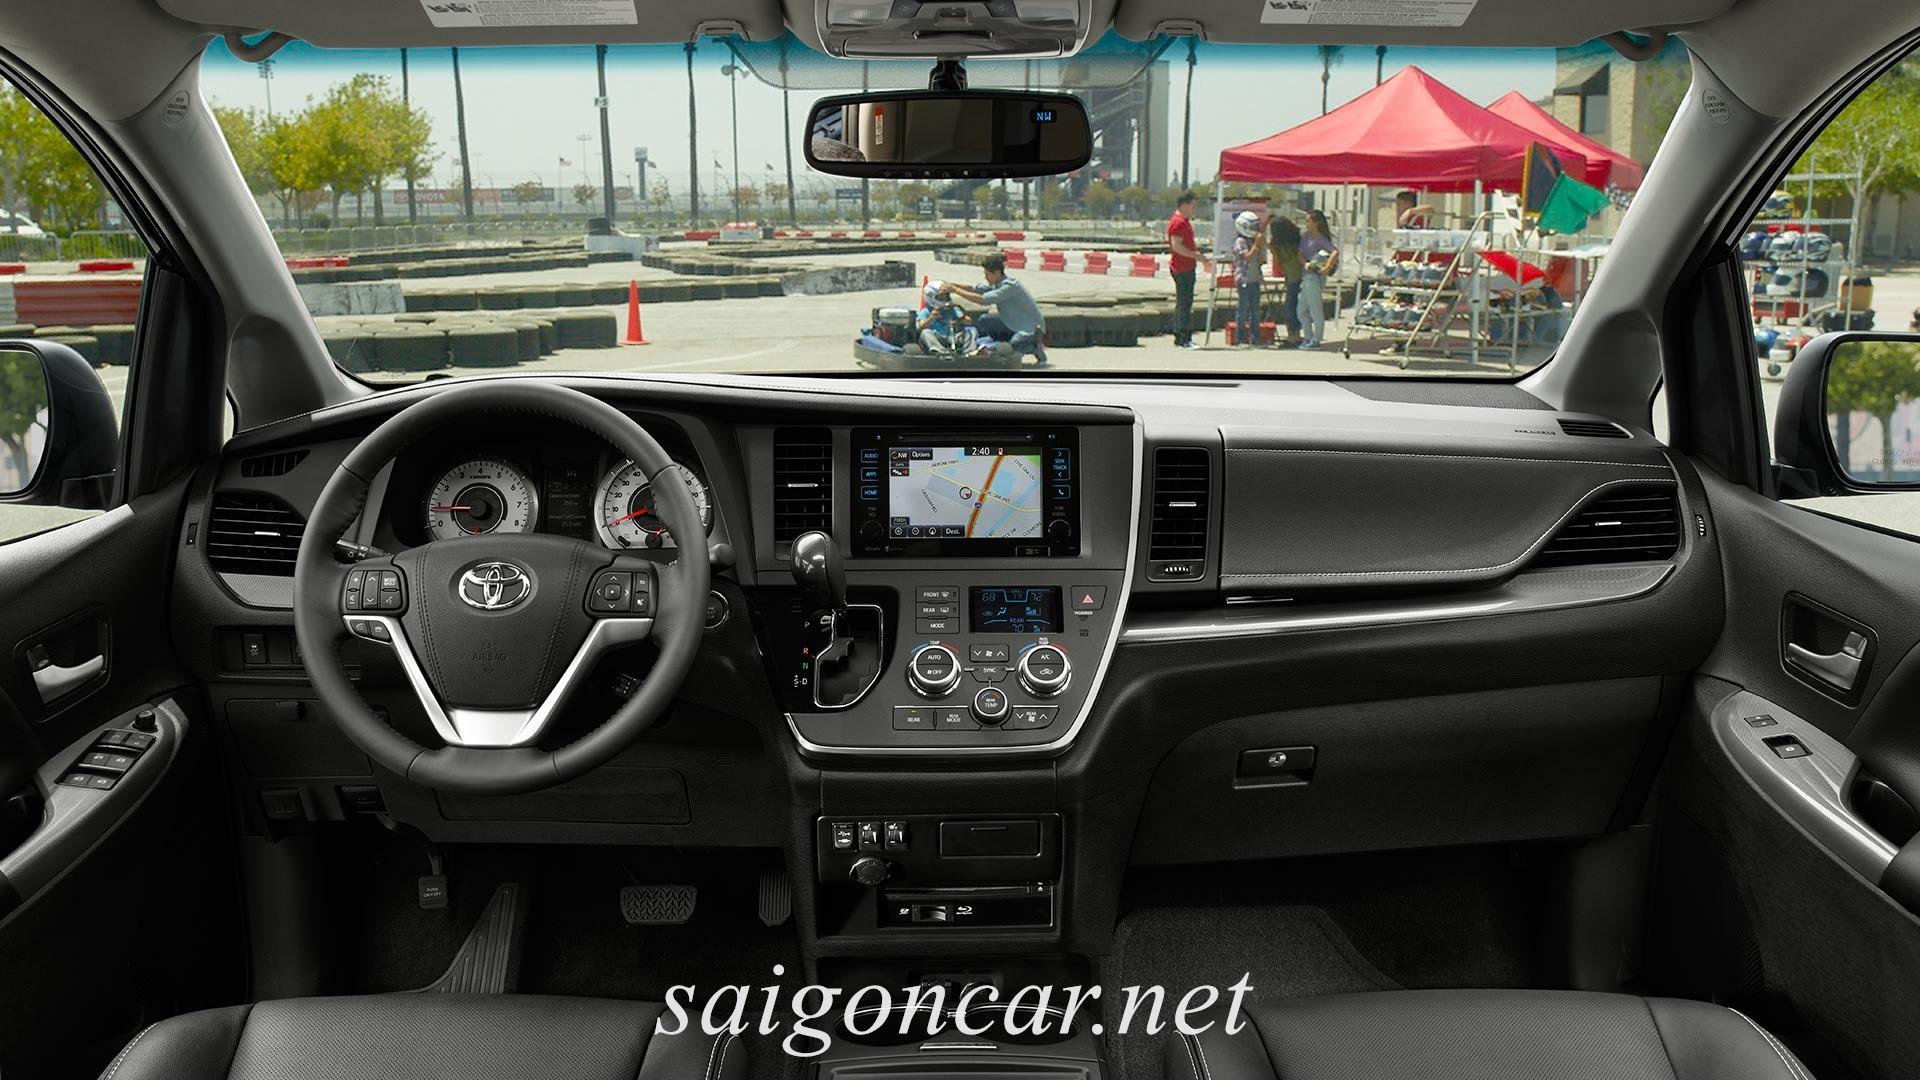 Toyota Sienna Khoang Lai Xe